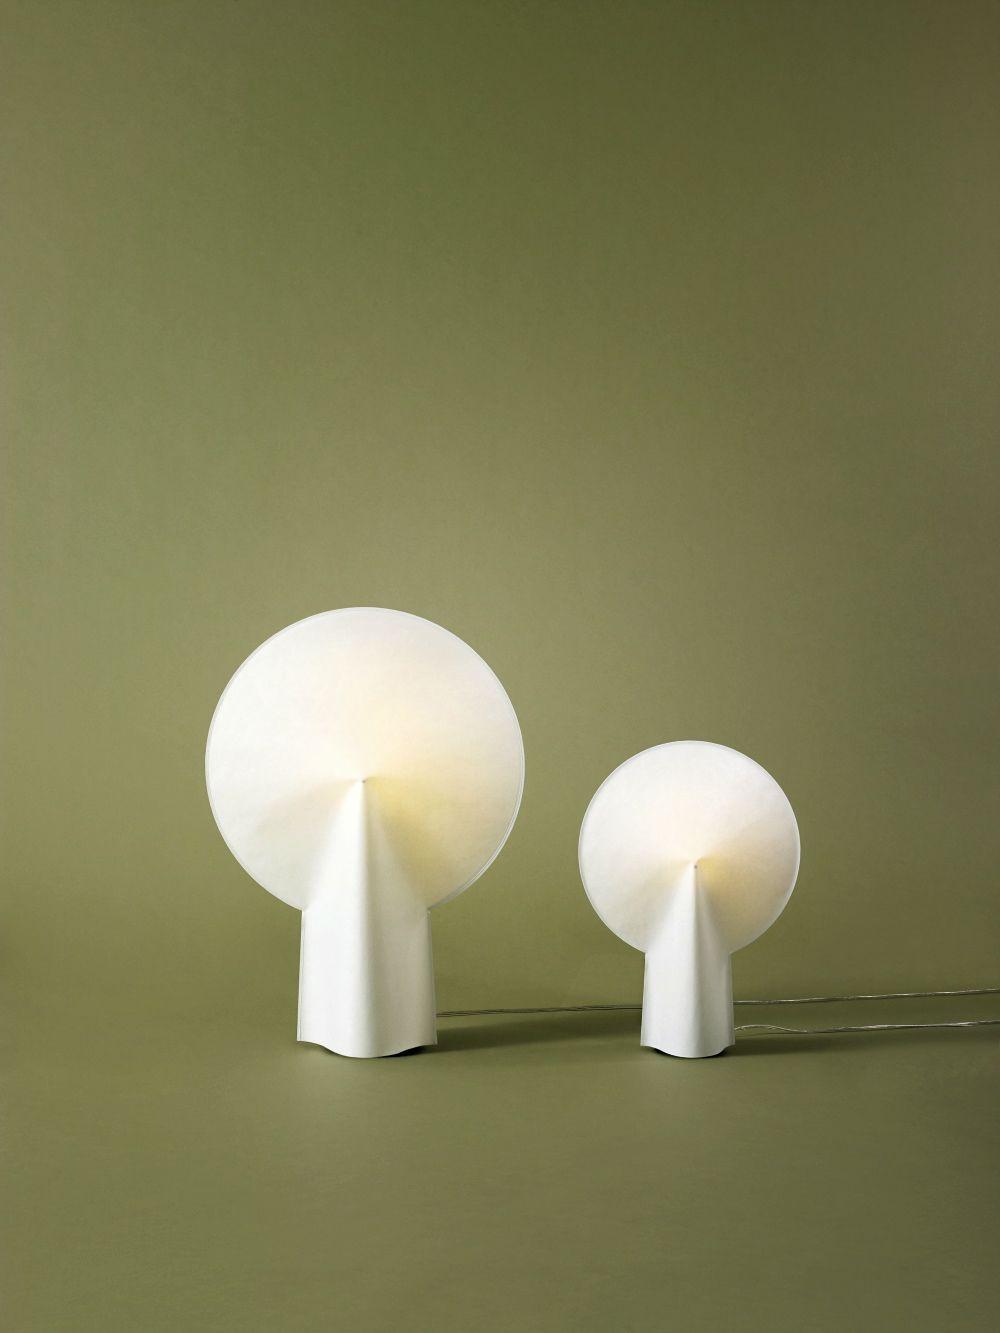 Amazing Lampe Pion HAY http madeindesign prod